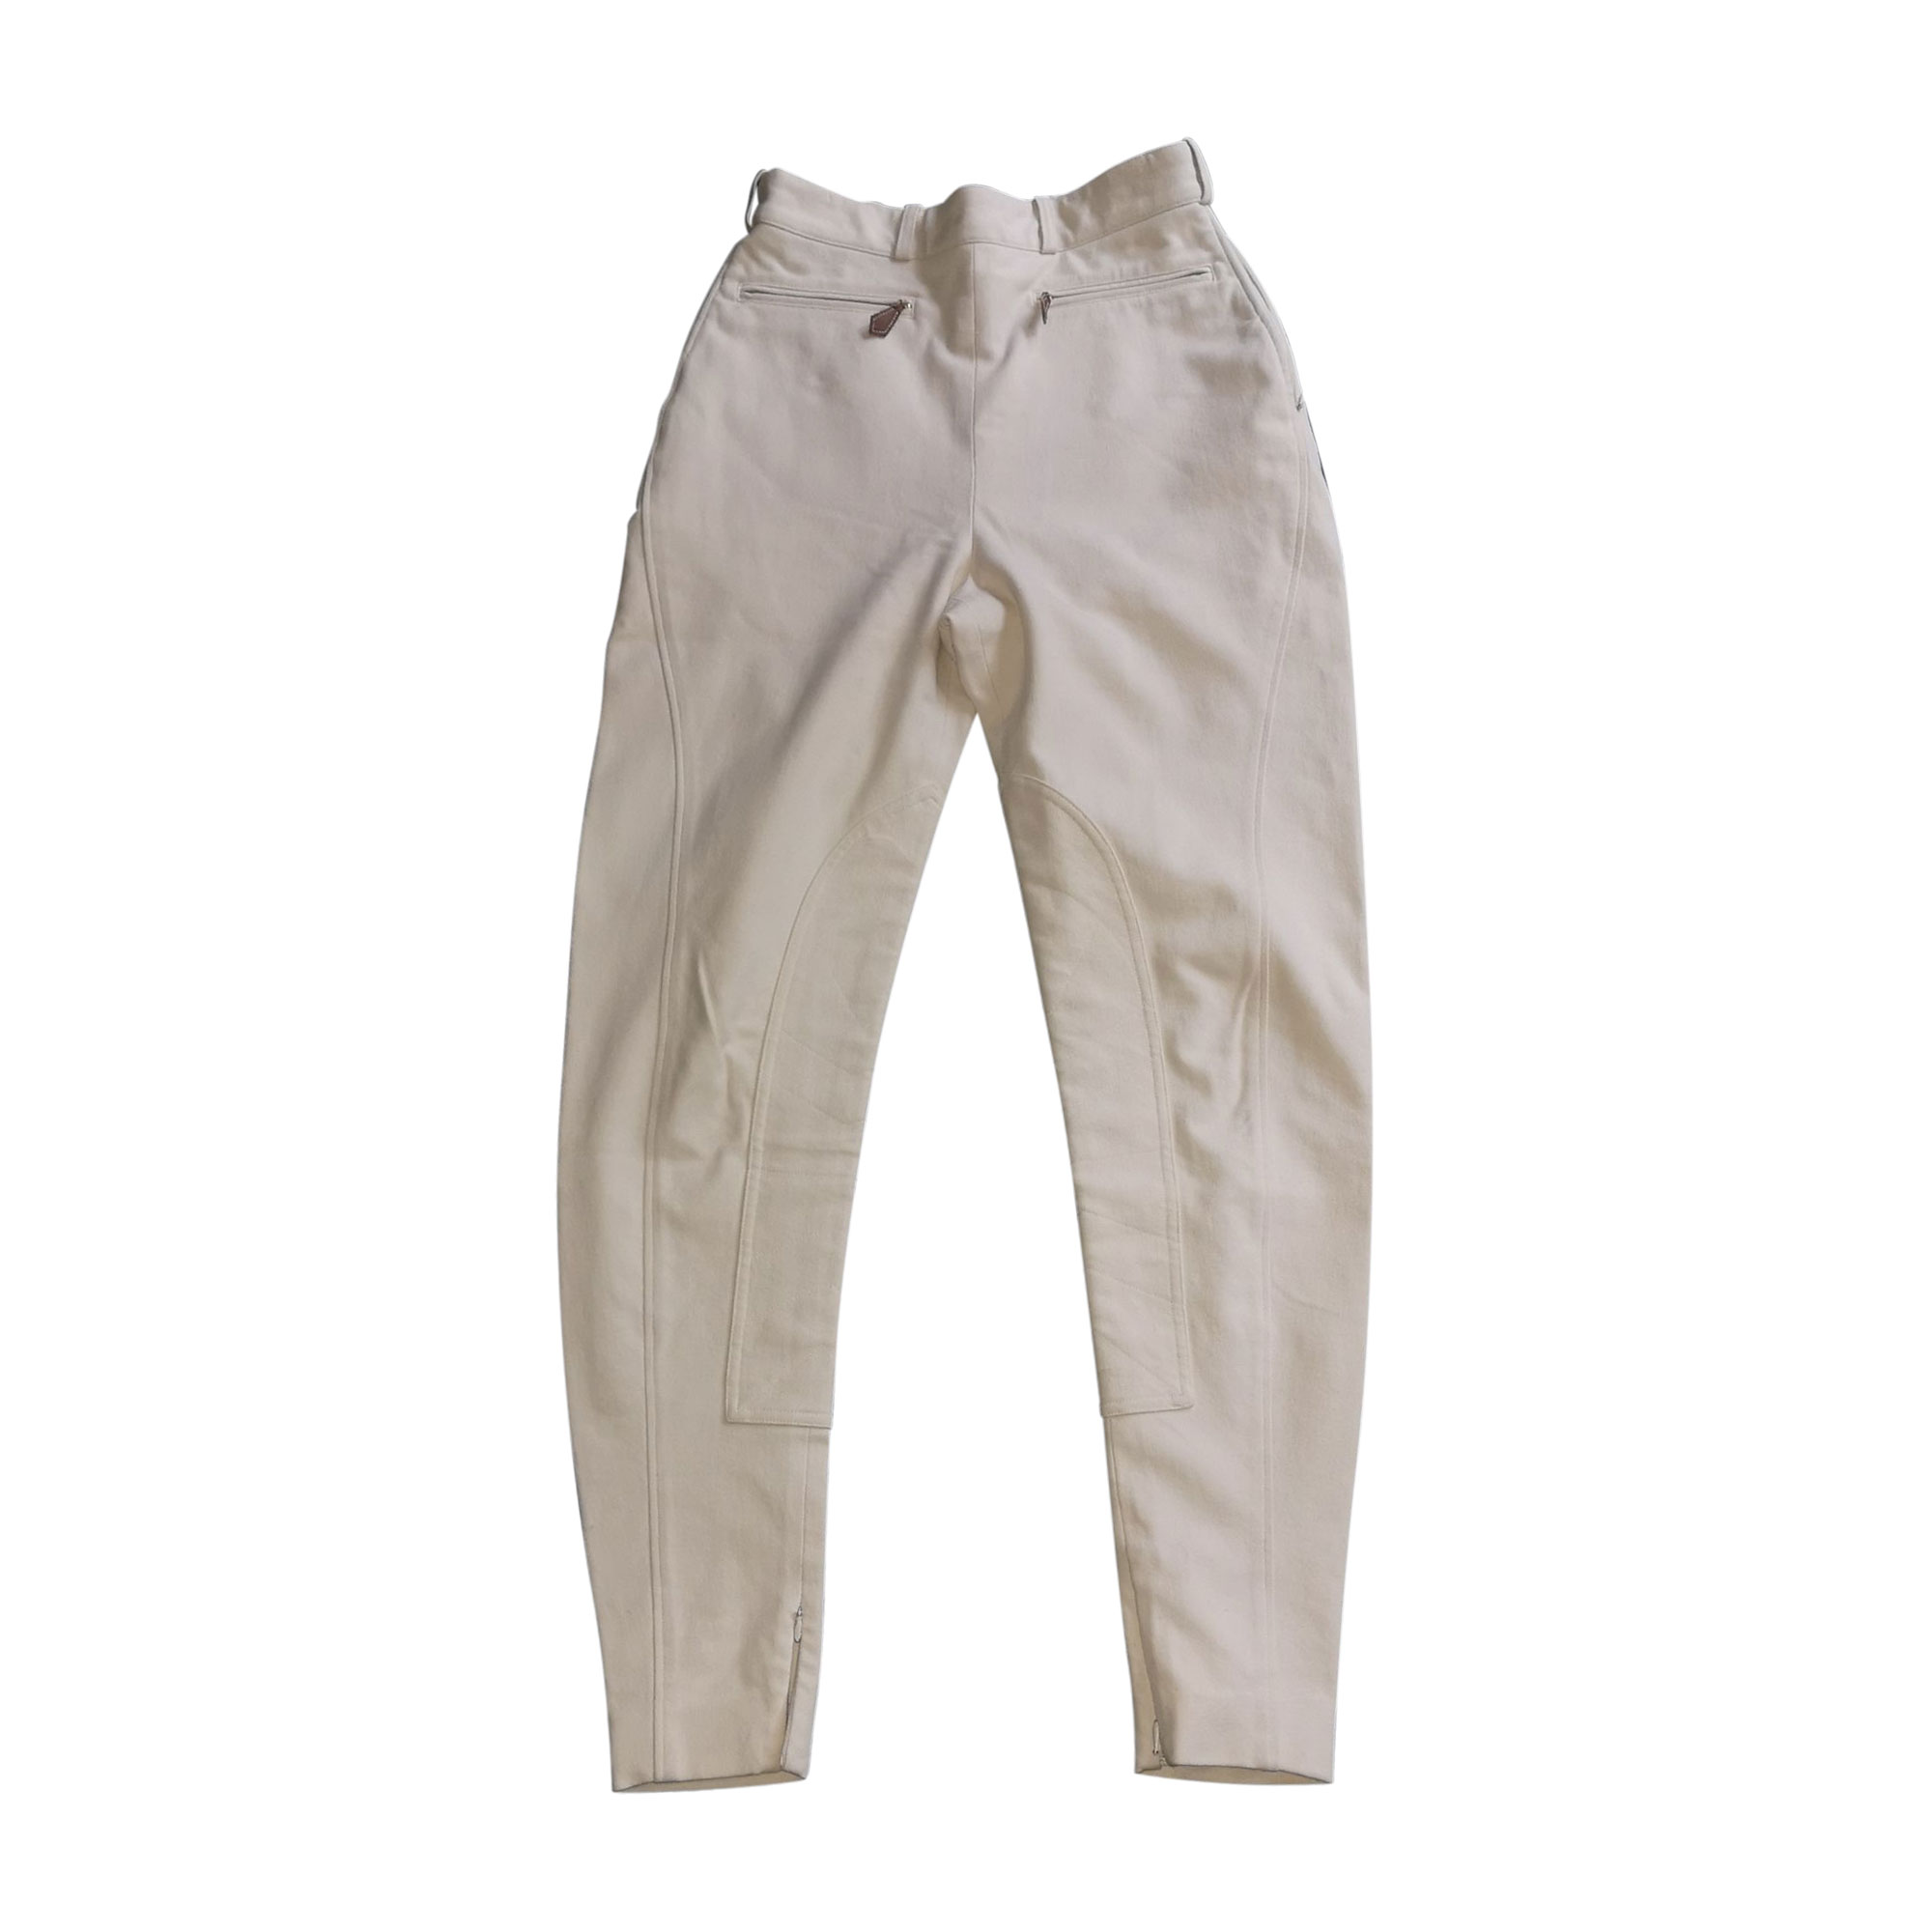 Pantalon slim, cigarette HERMÈS Blanc, blanc cassé, écru